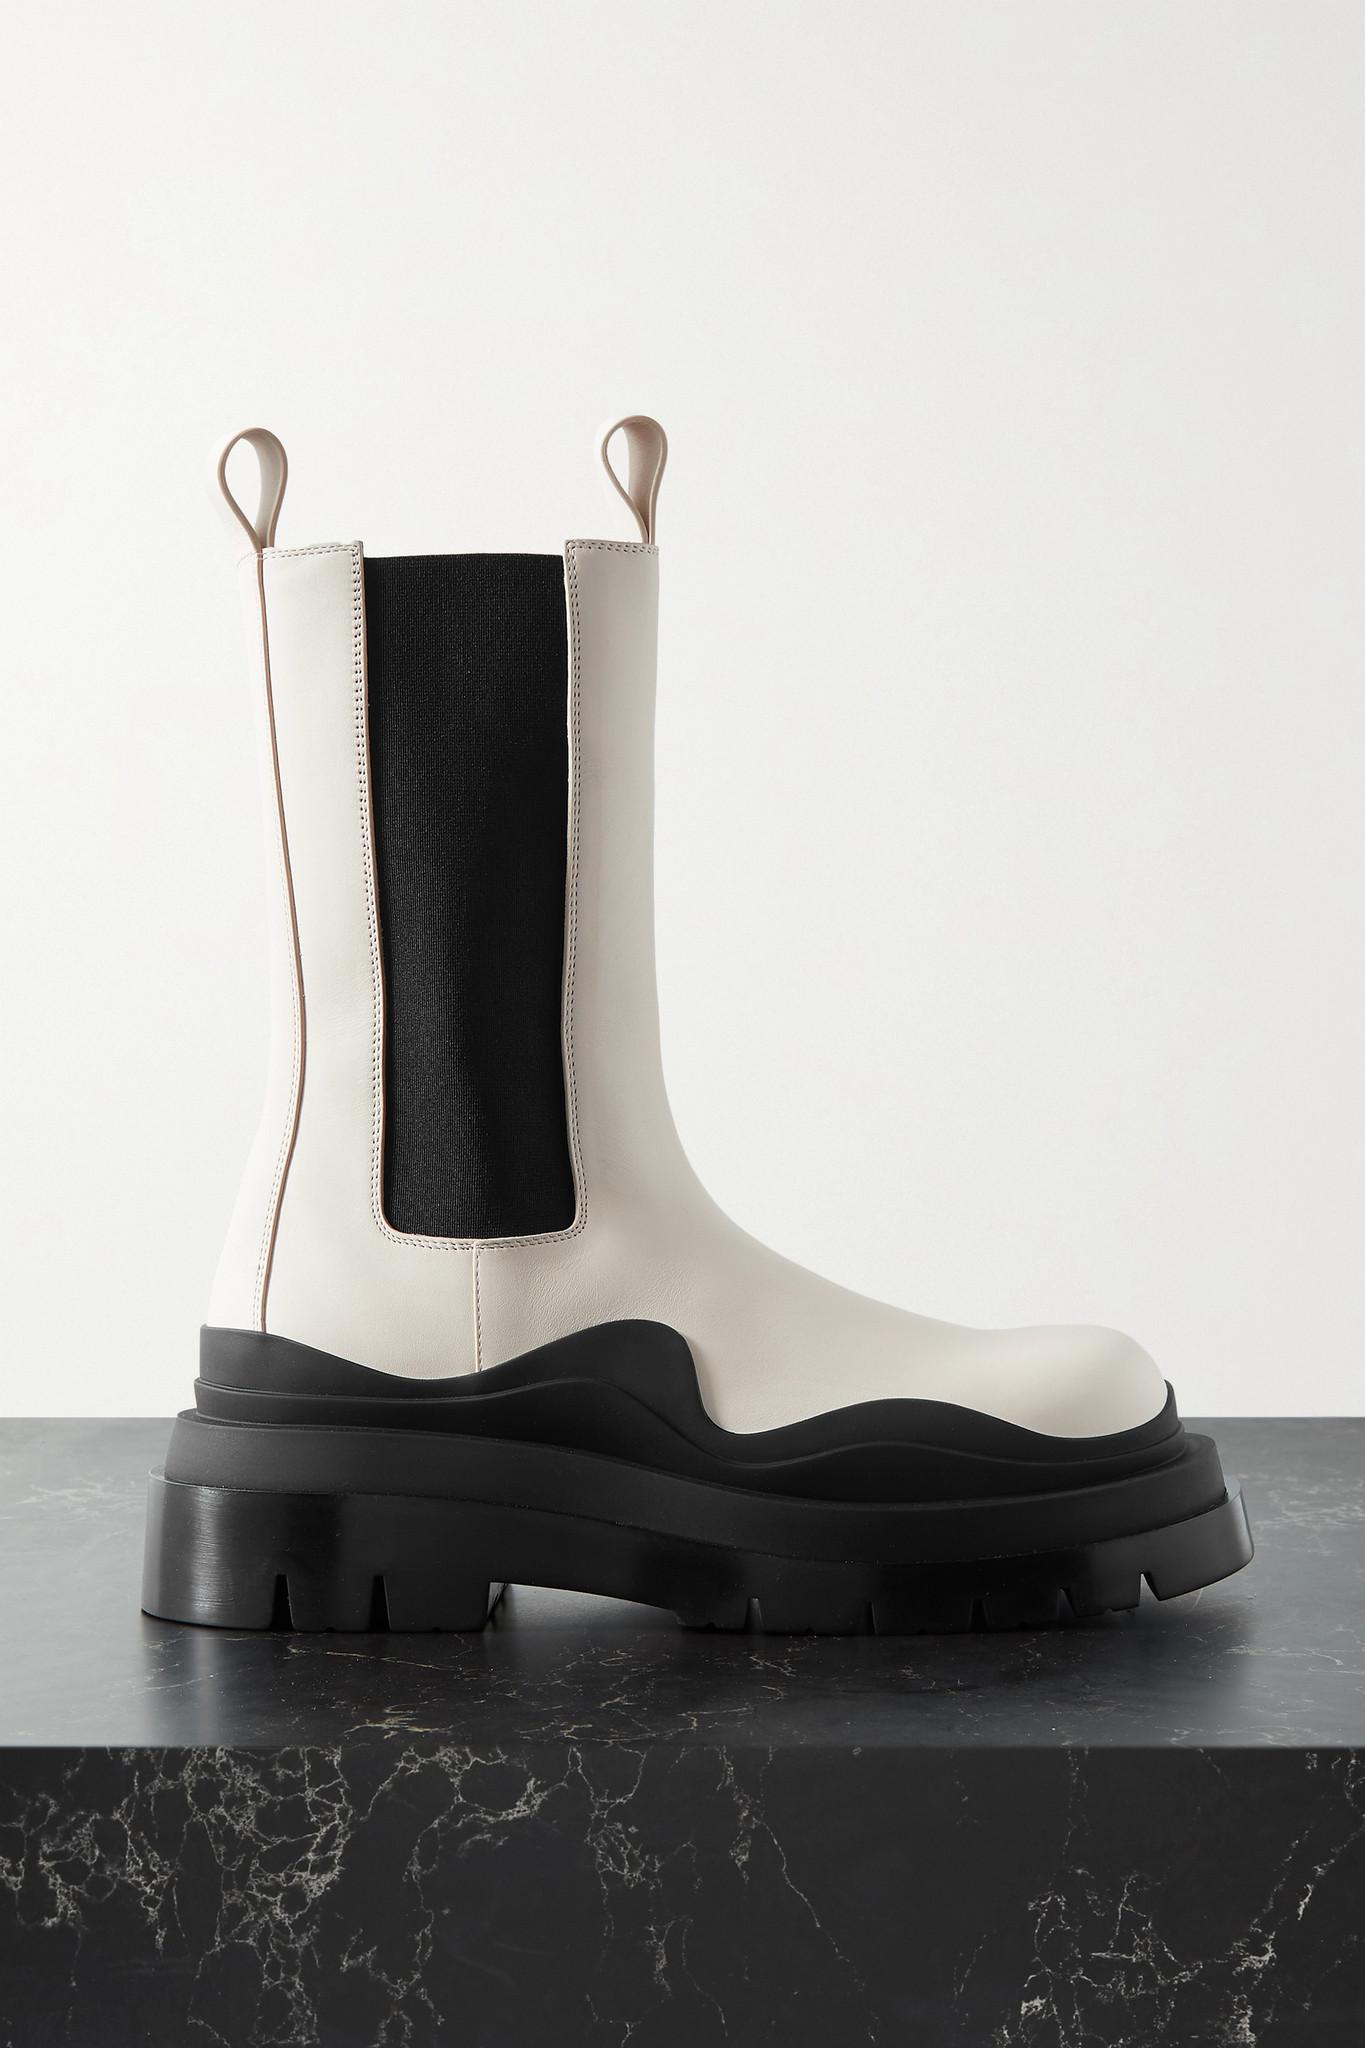 BOTTEGA VENETA - Tire Rubber-trimmed Leather Chelsea Boots - Off-white - IT38.5